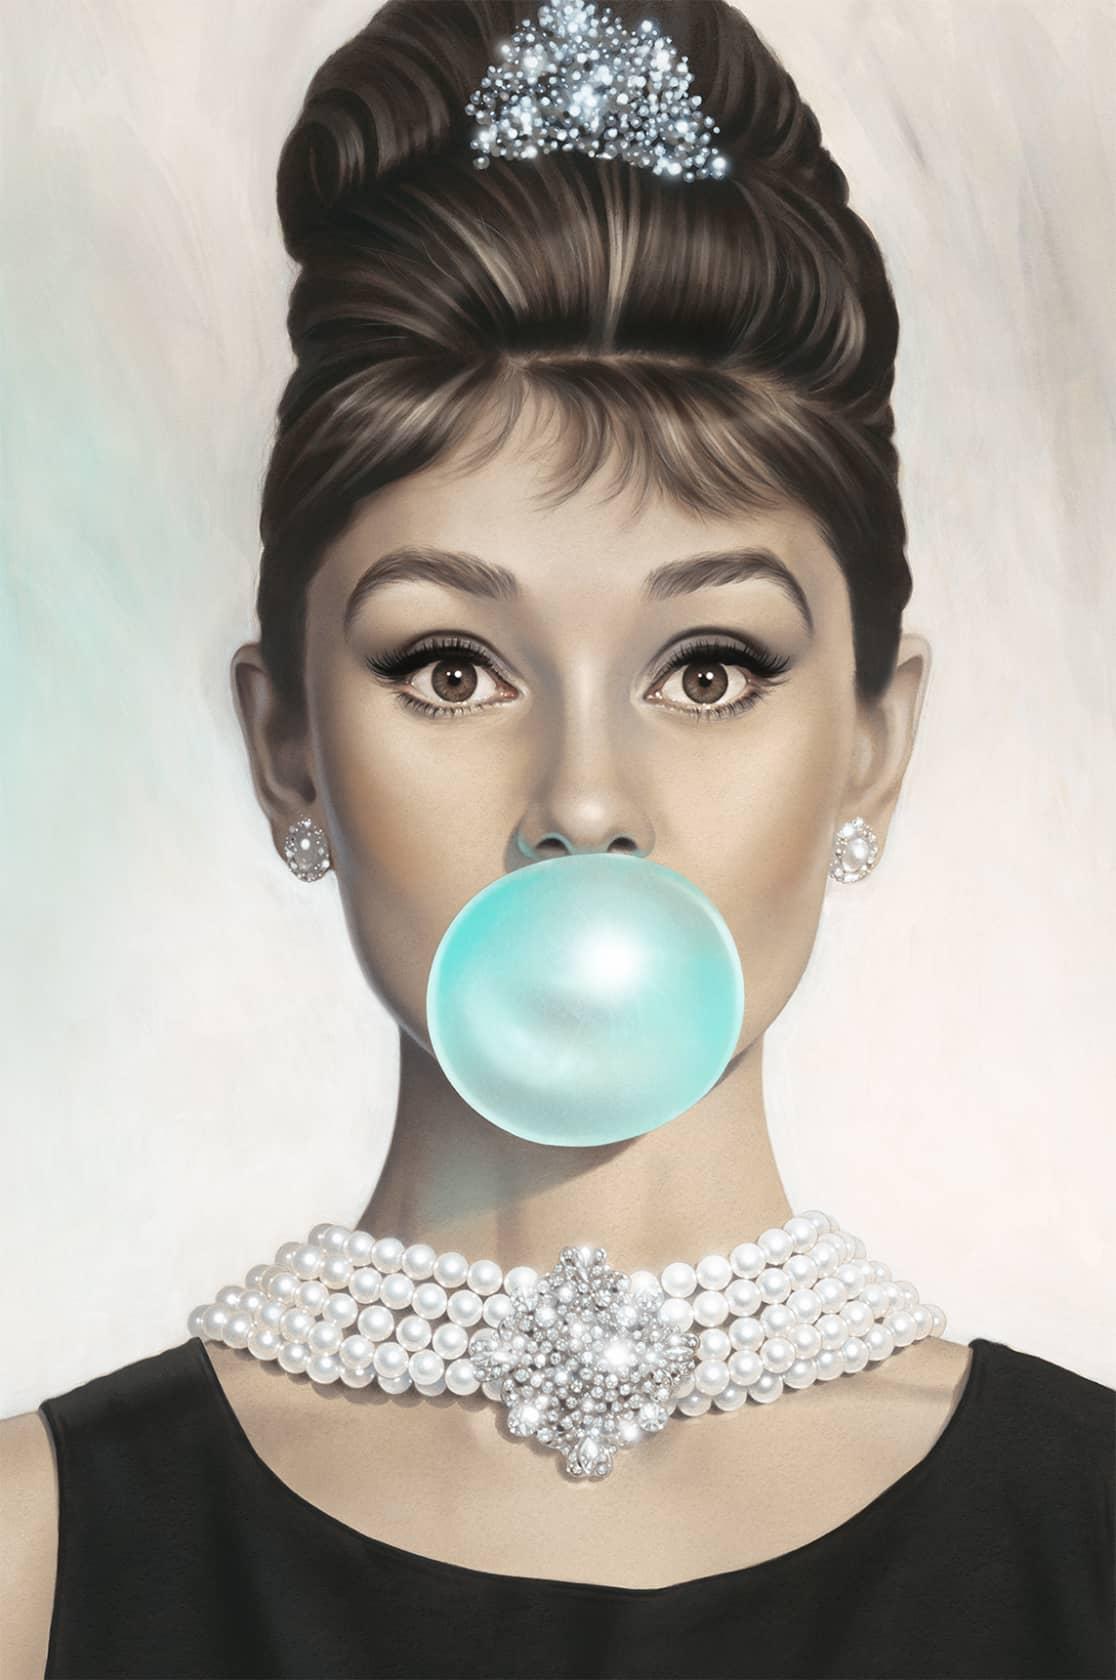 Michael Moebius, Audrey Hepburn Tiffany Blue, 2017